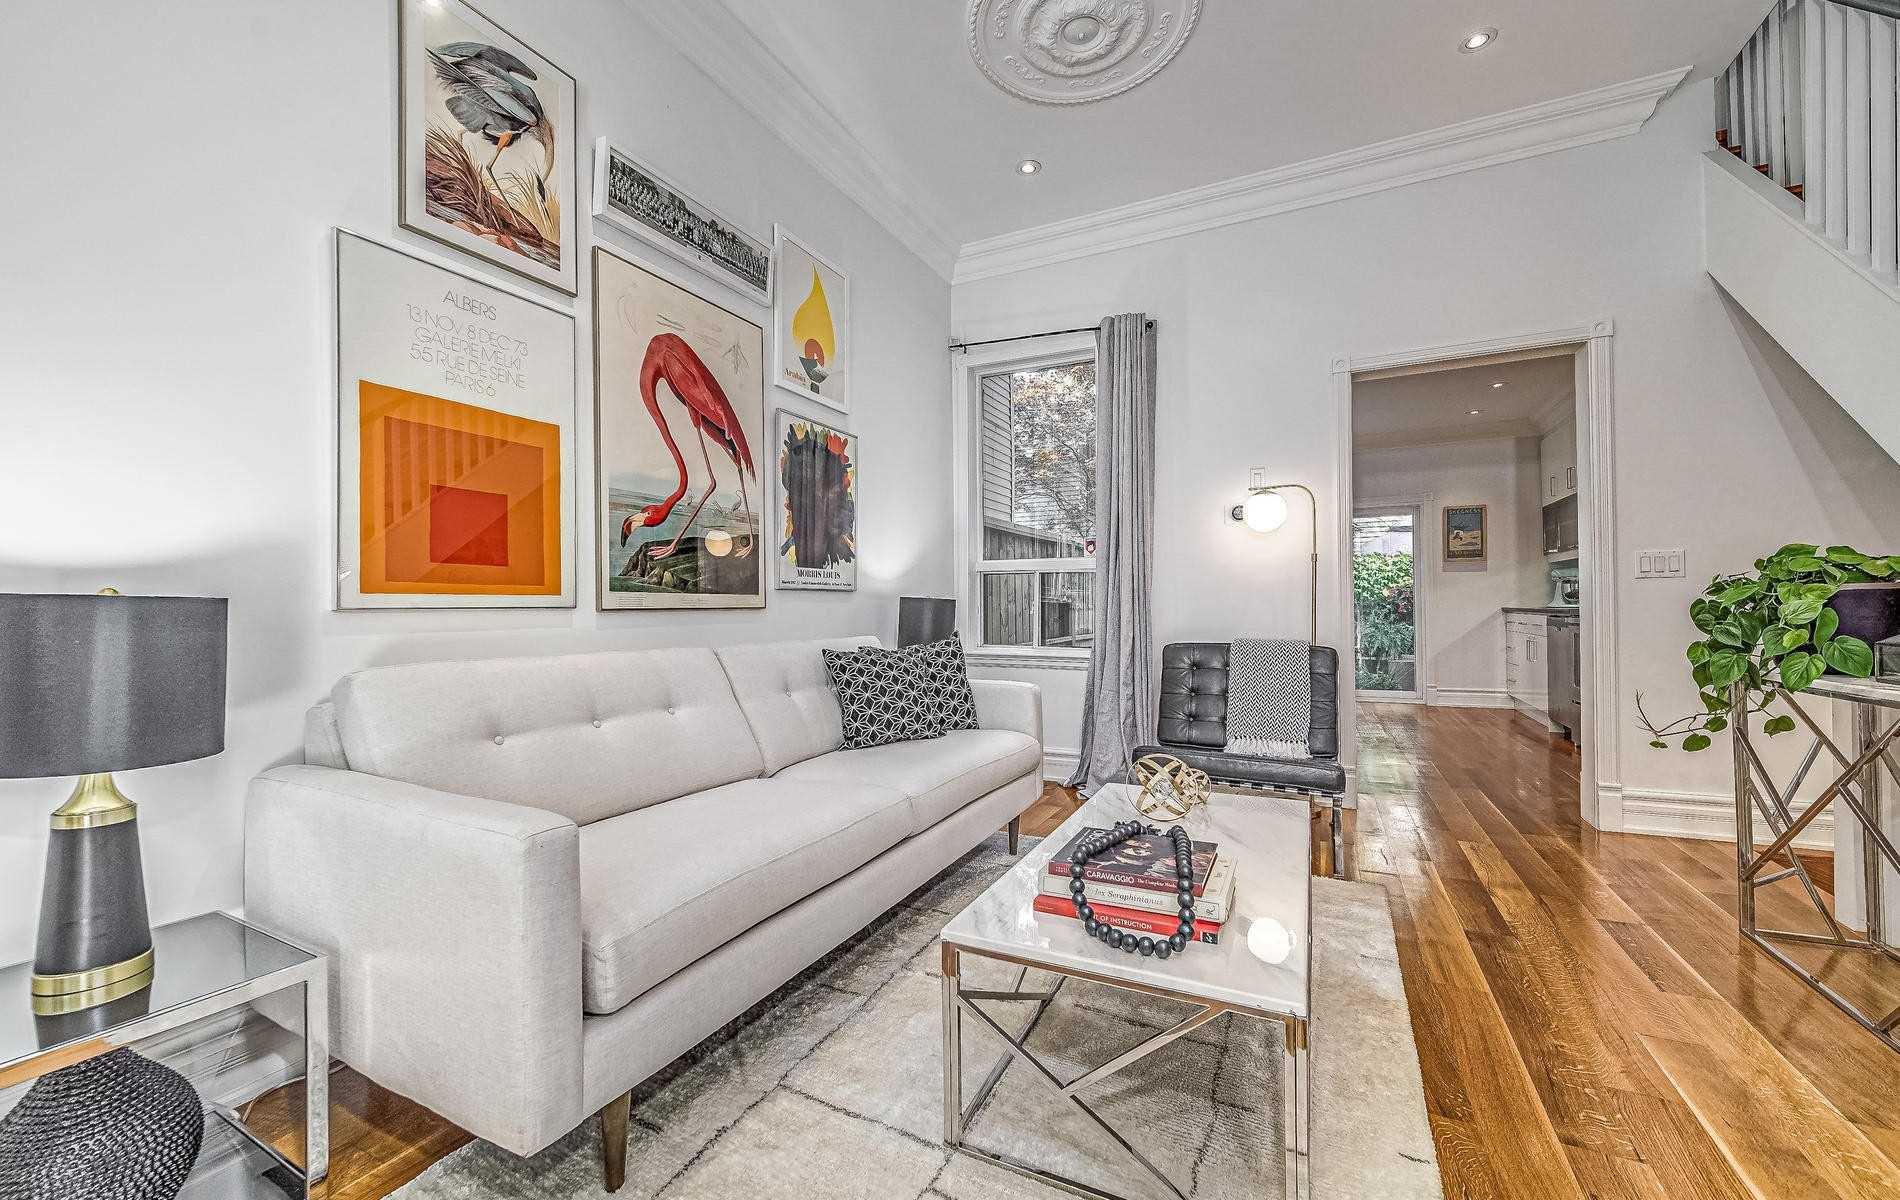 Main Photo: 22 Wardell Street in Toronto: South Riverdale House (2-Storey) for sale (Toronto E01)  : MLS®# E4866318